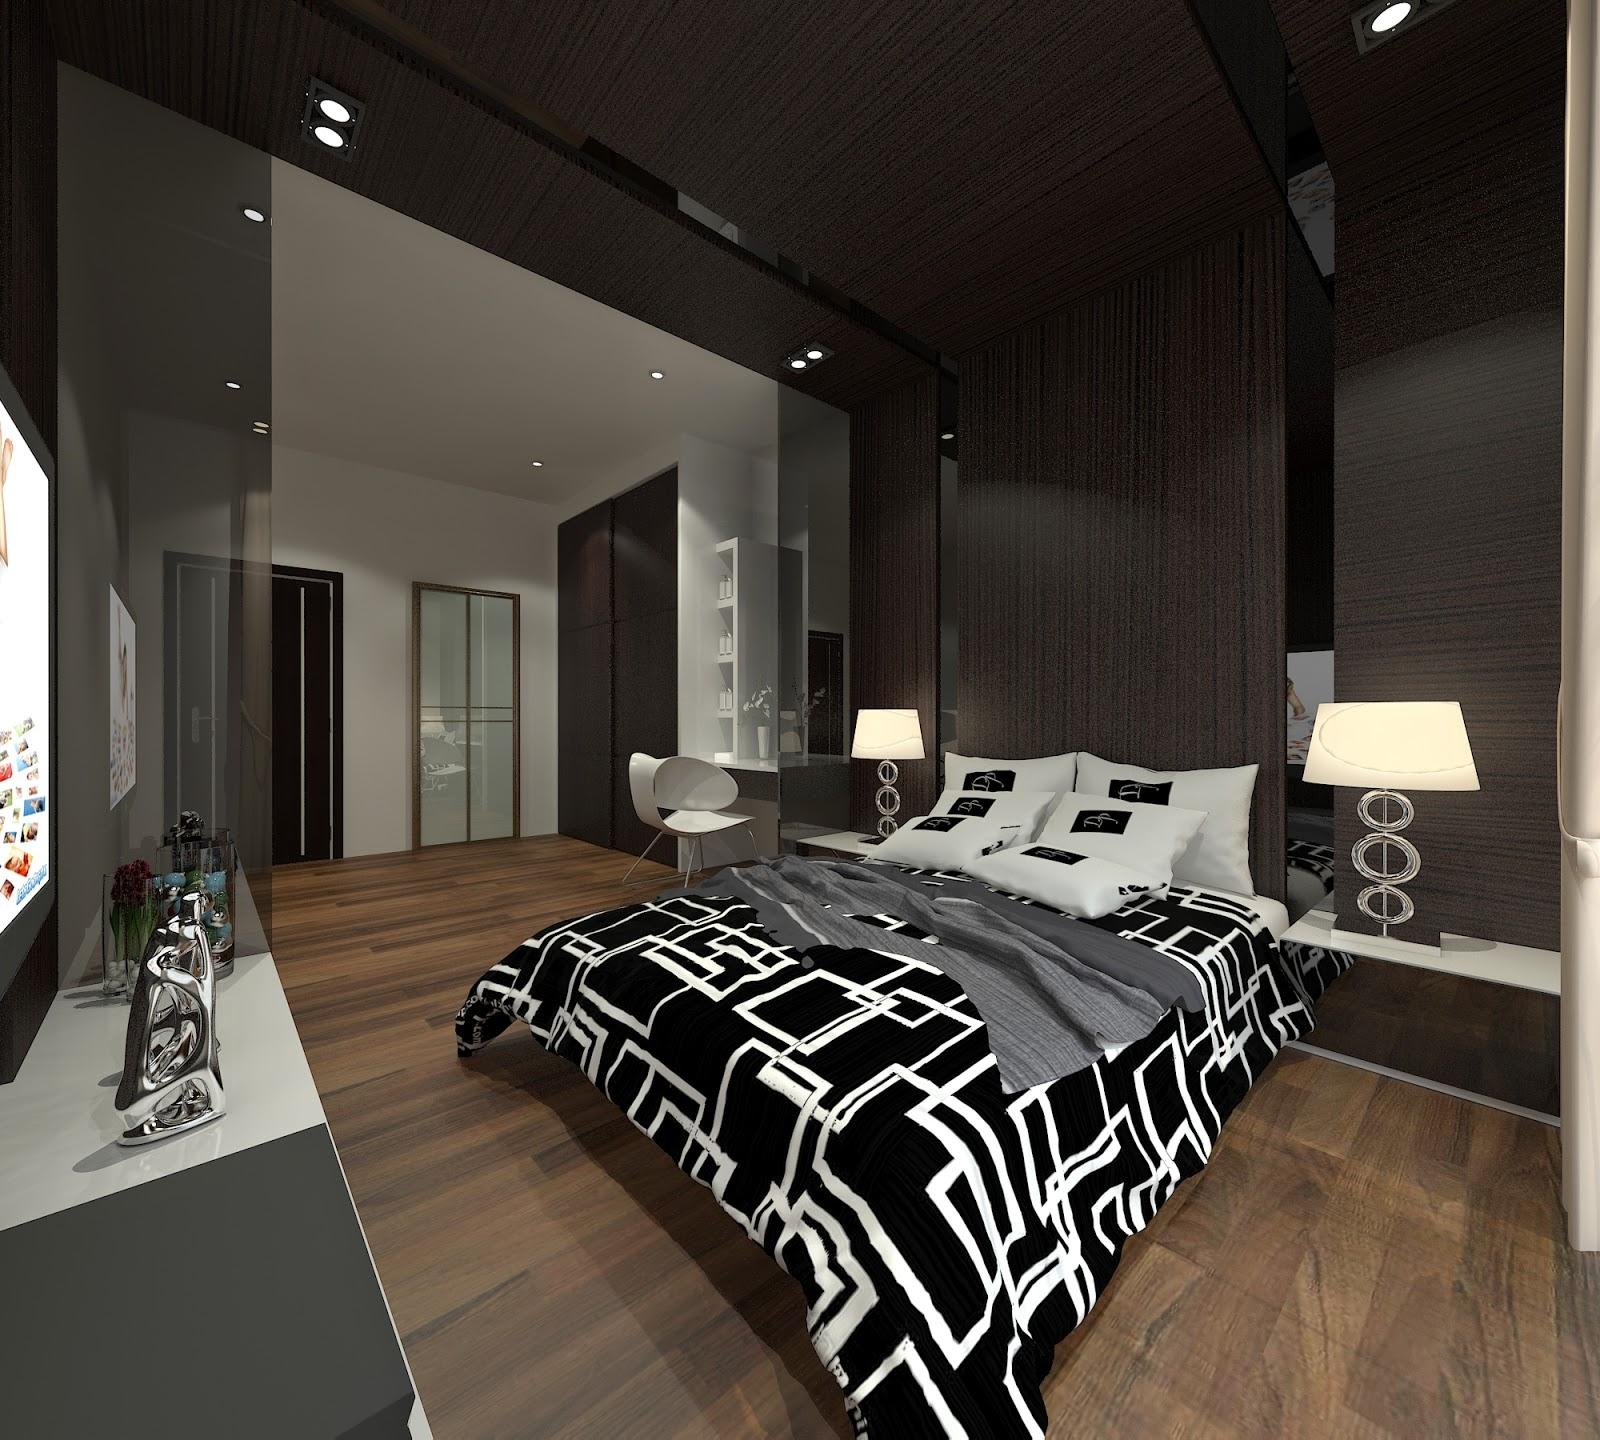 Malaysia Home Renovation Blog: January 2015